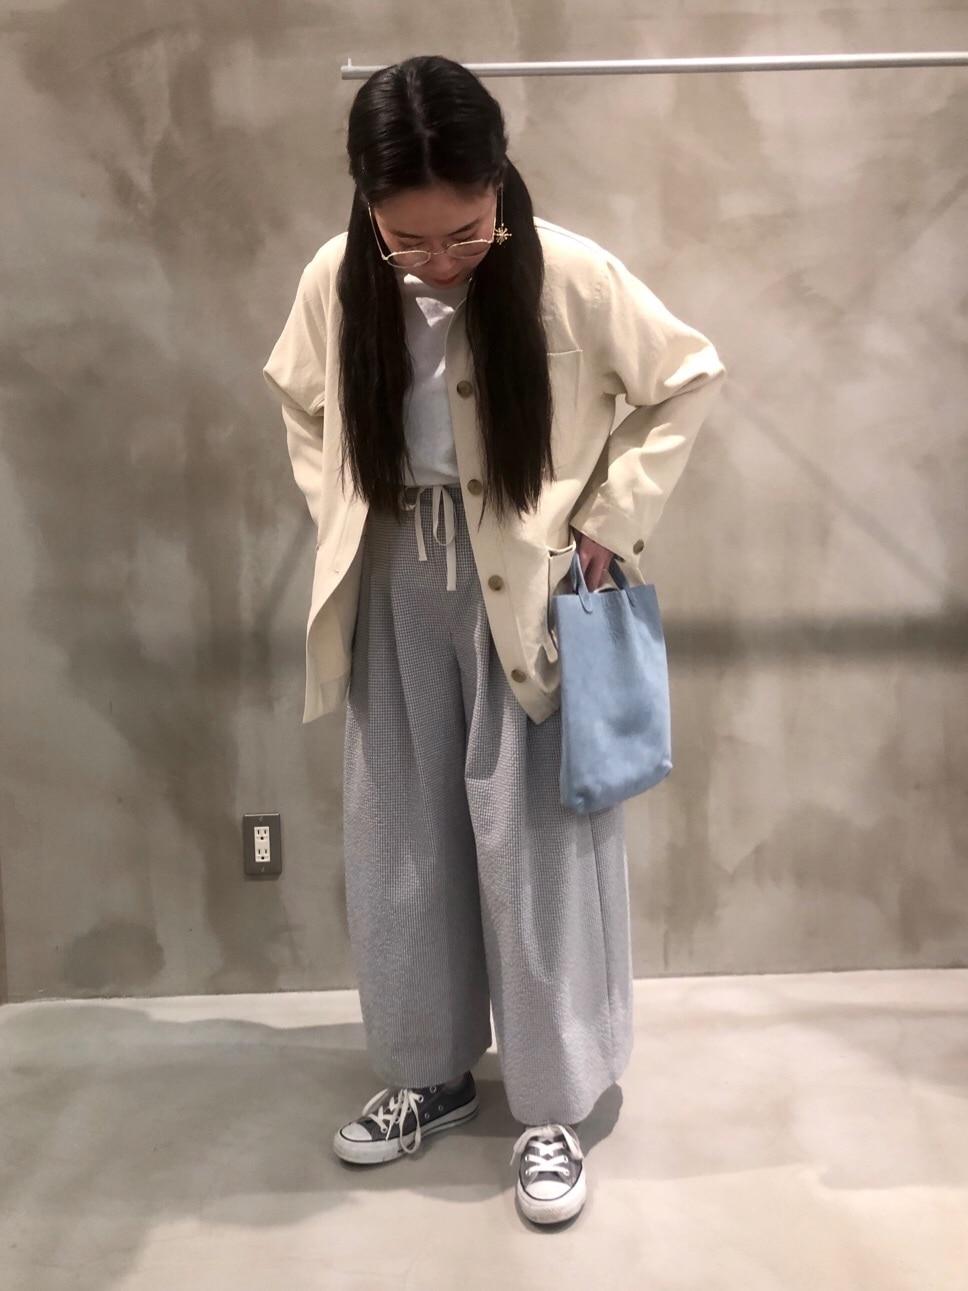 bulle de savon 渋谷スクランブルスクエア 身長:157cm 2020.03.11